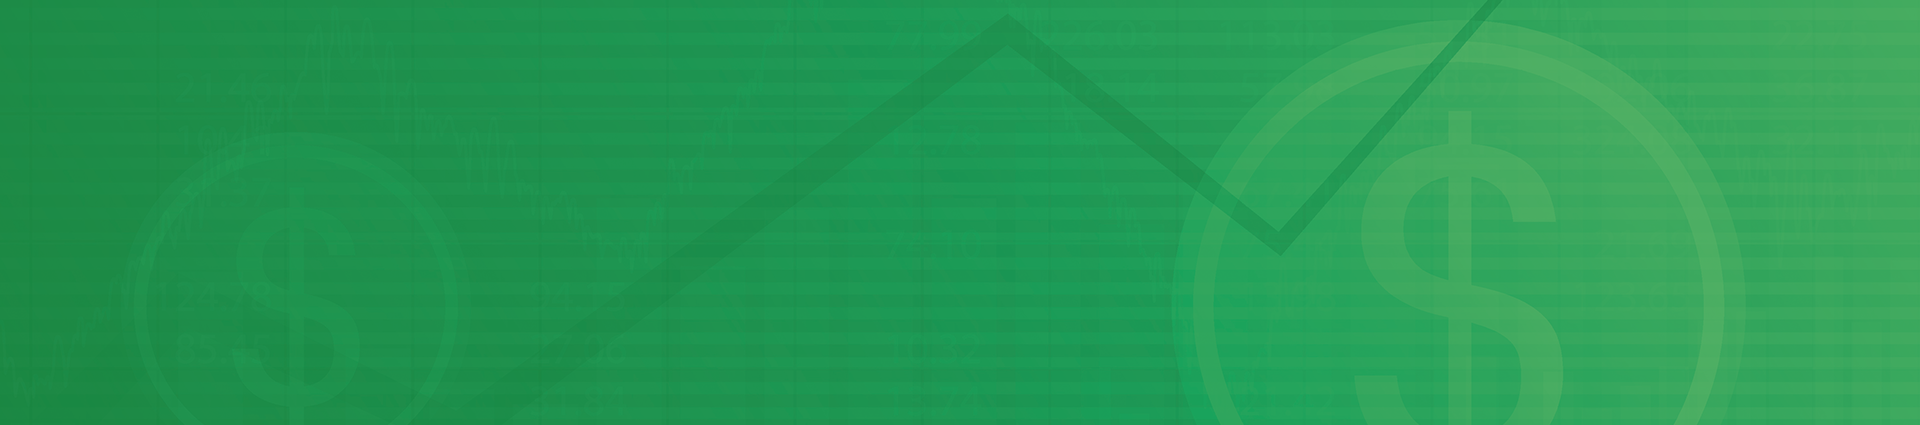 IRAR Affordabe fees Green.png